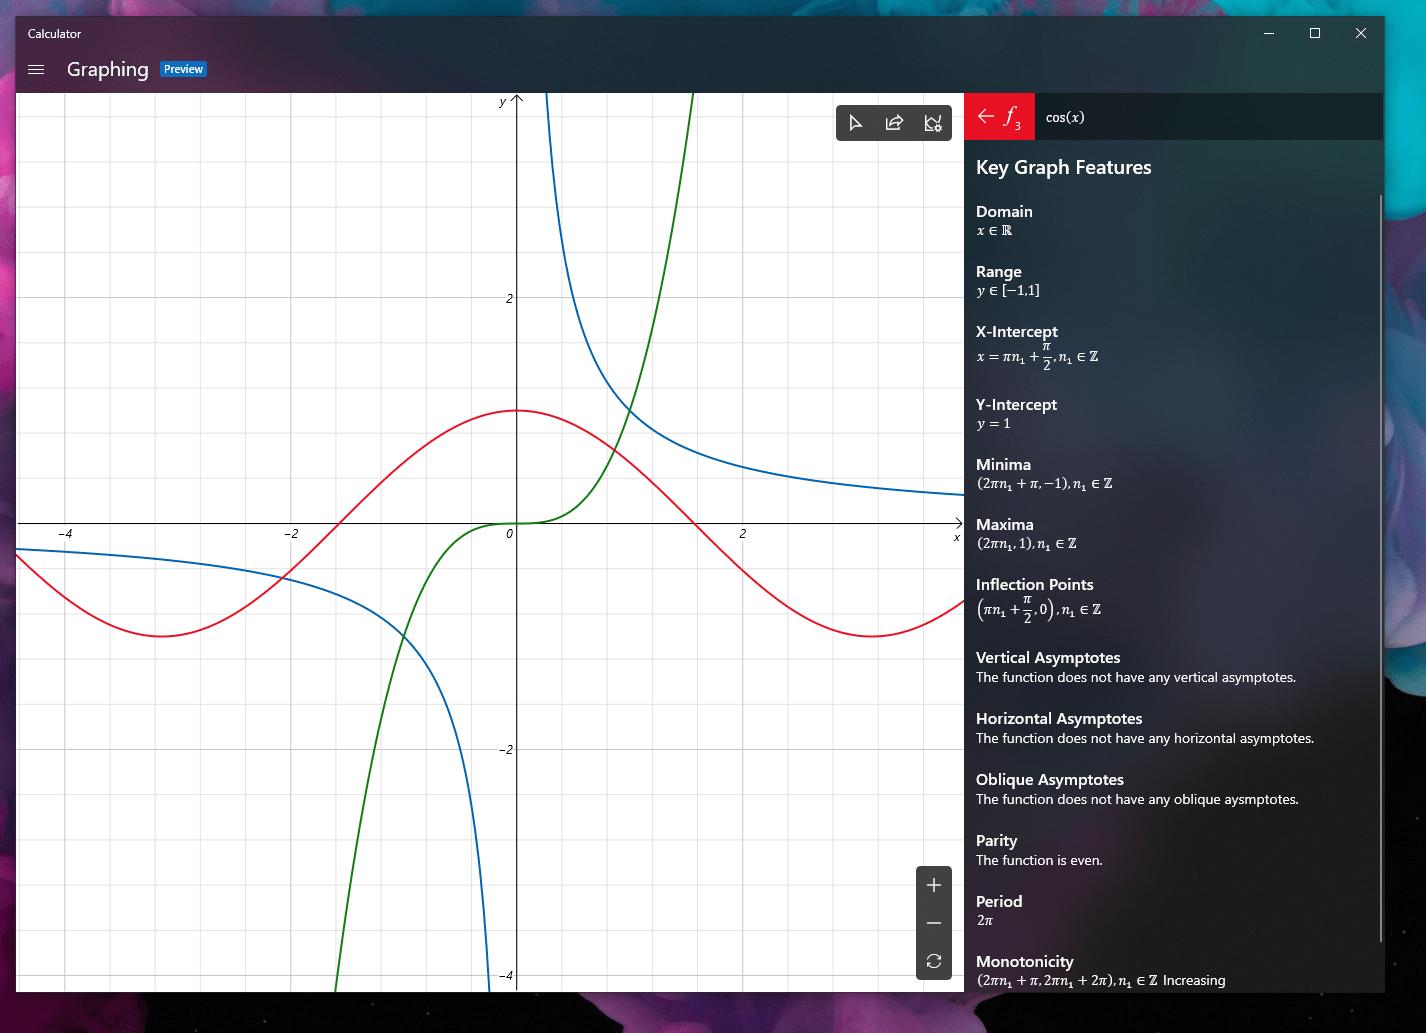 Windows Calculator graphic mode